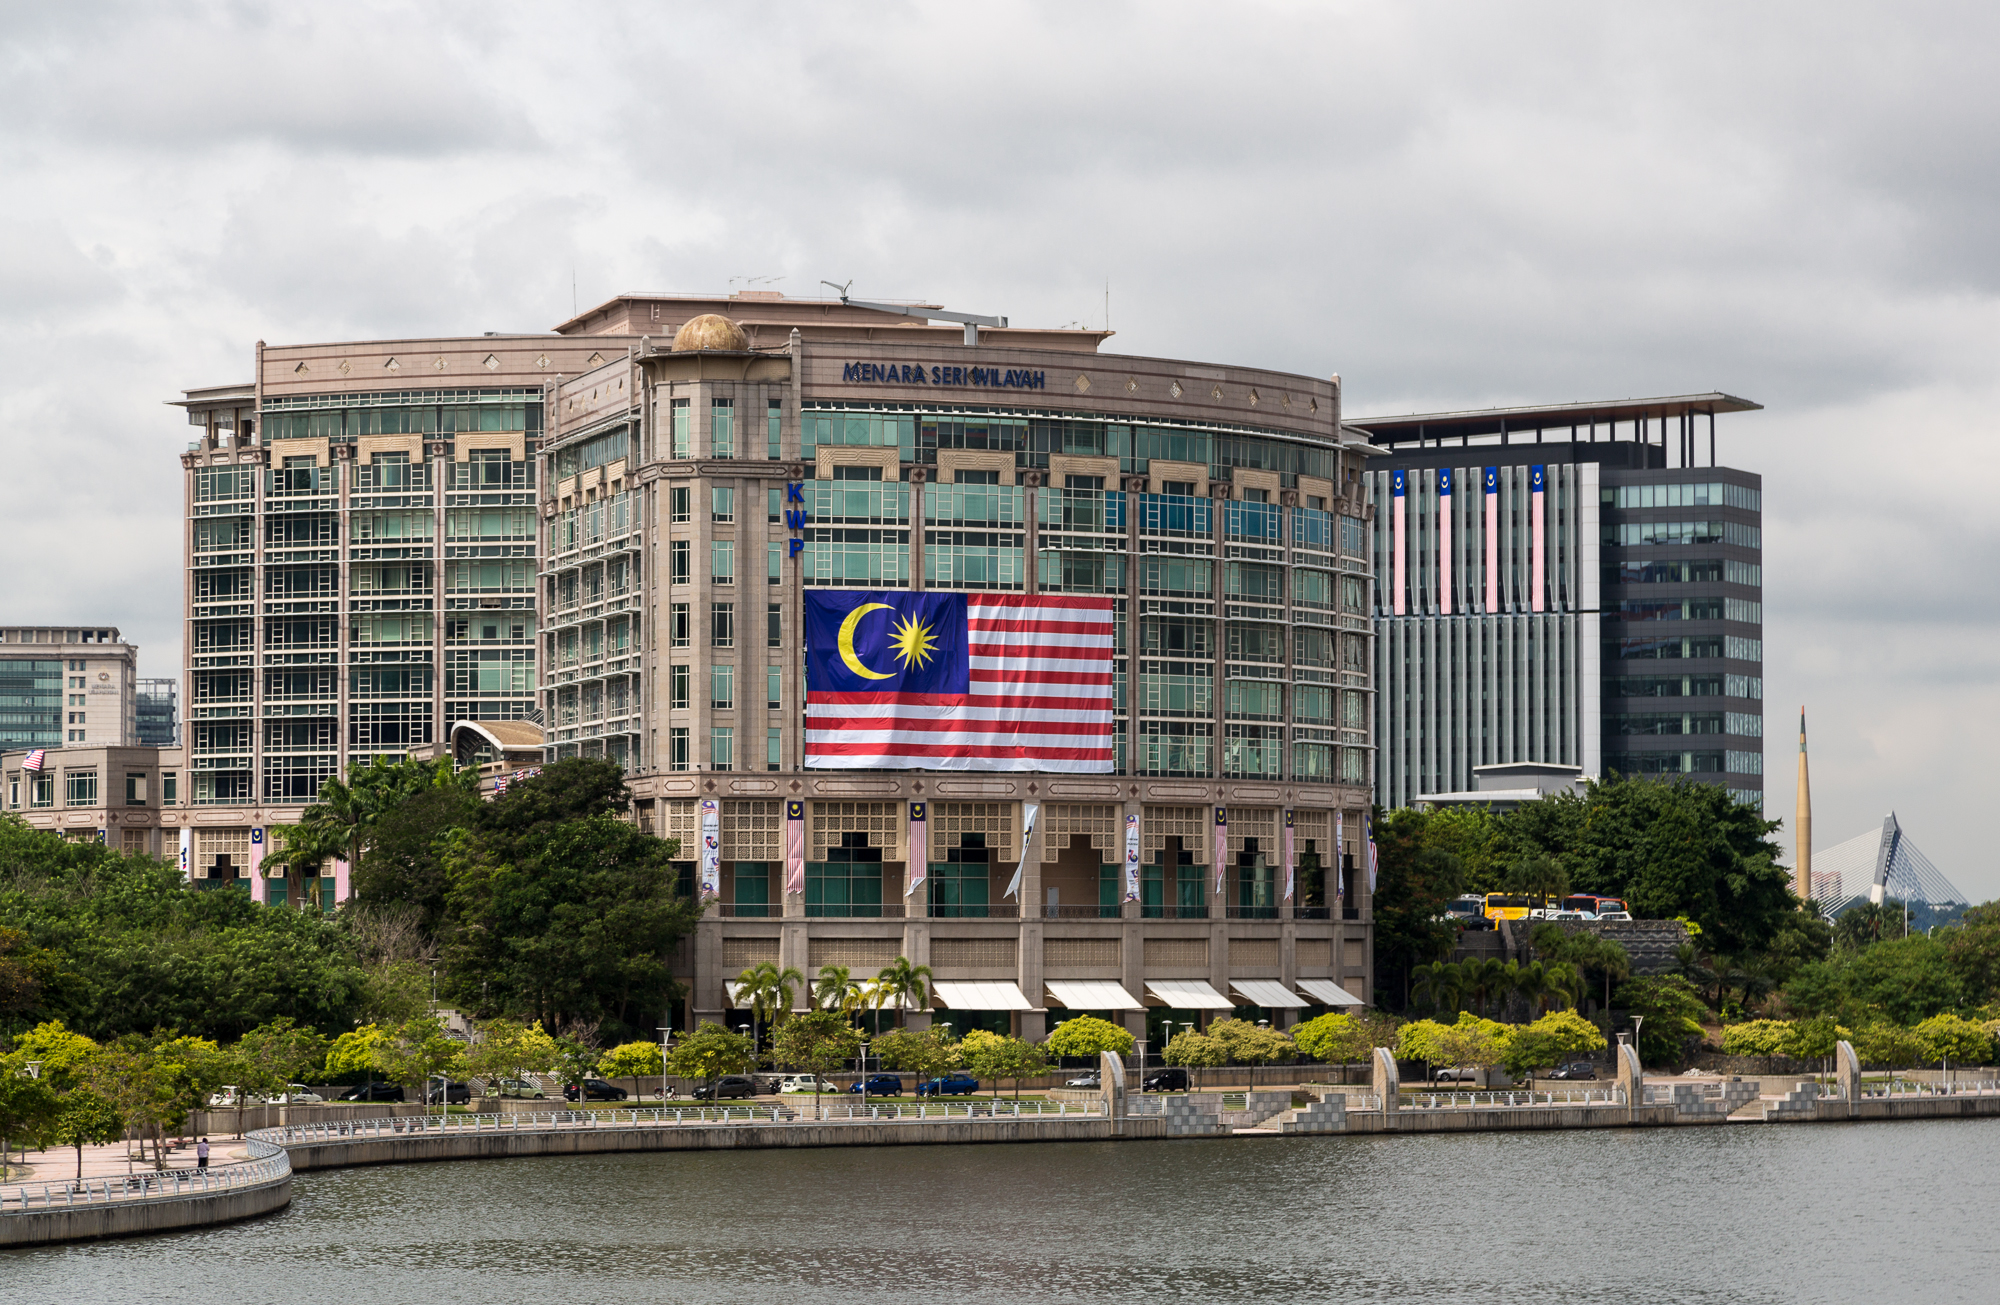 Kementerian Wilayah Persekutuan Malaysia Wikiwand